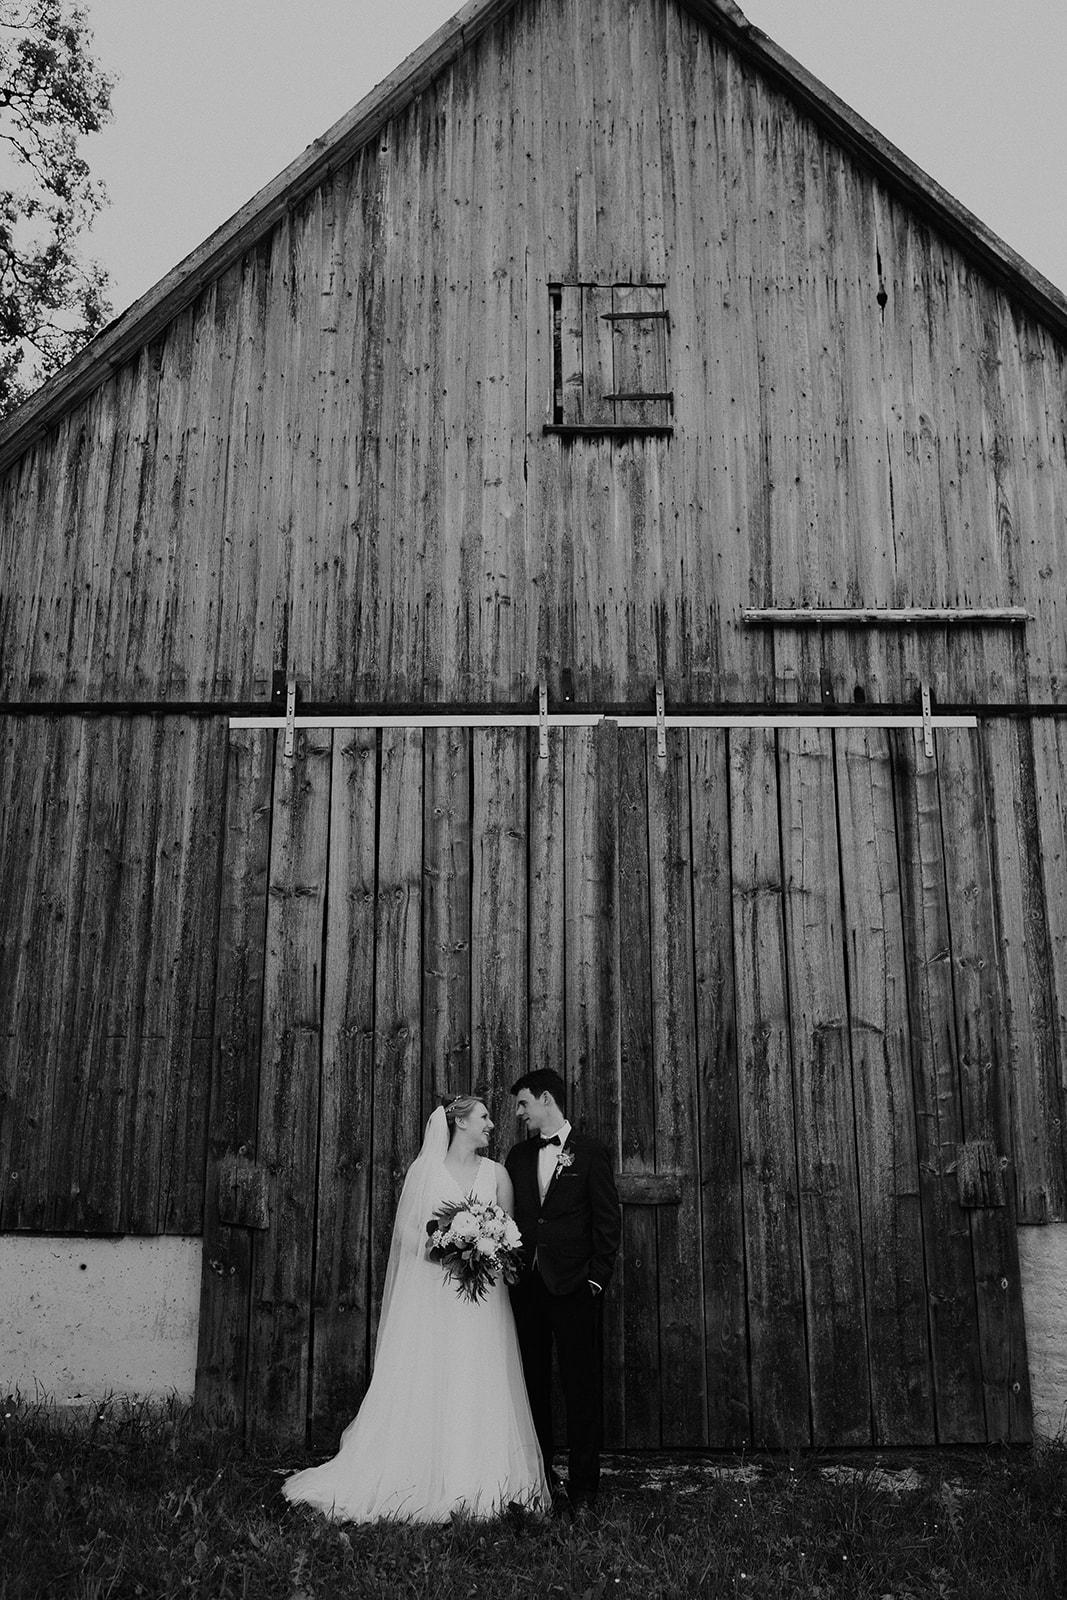 Christina___Julian_57_Hochzeitsfotograf_Craislheim.jpg